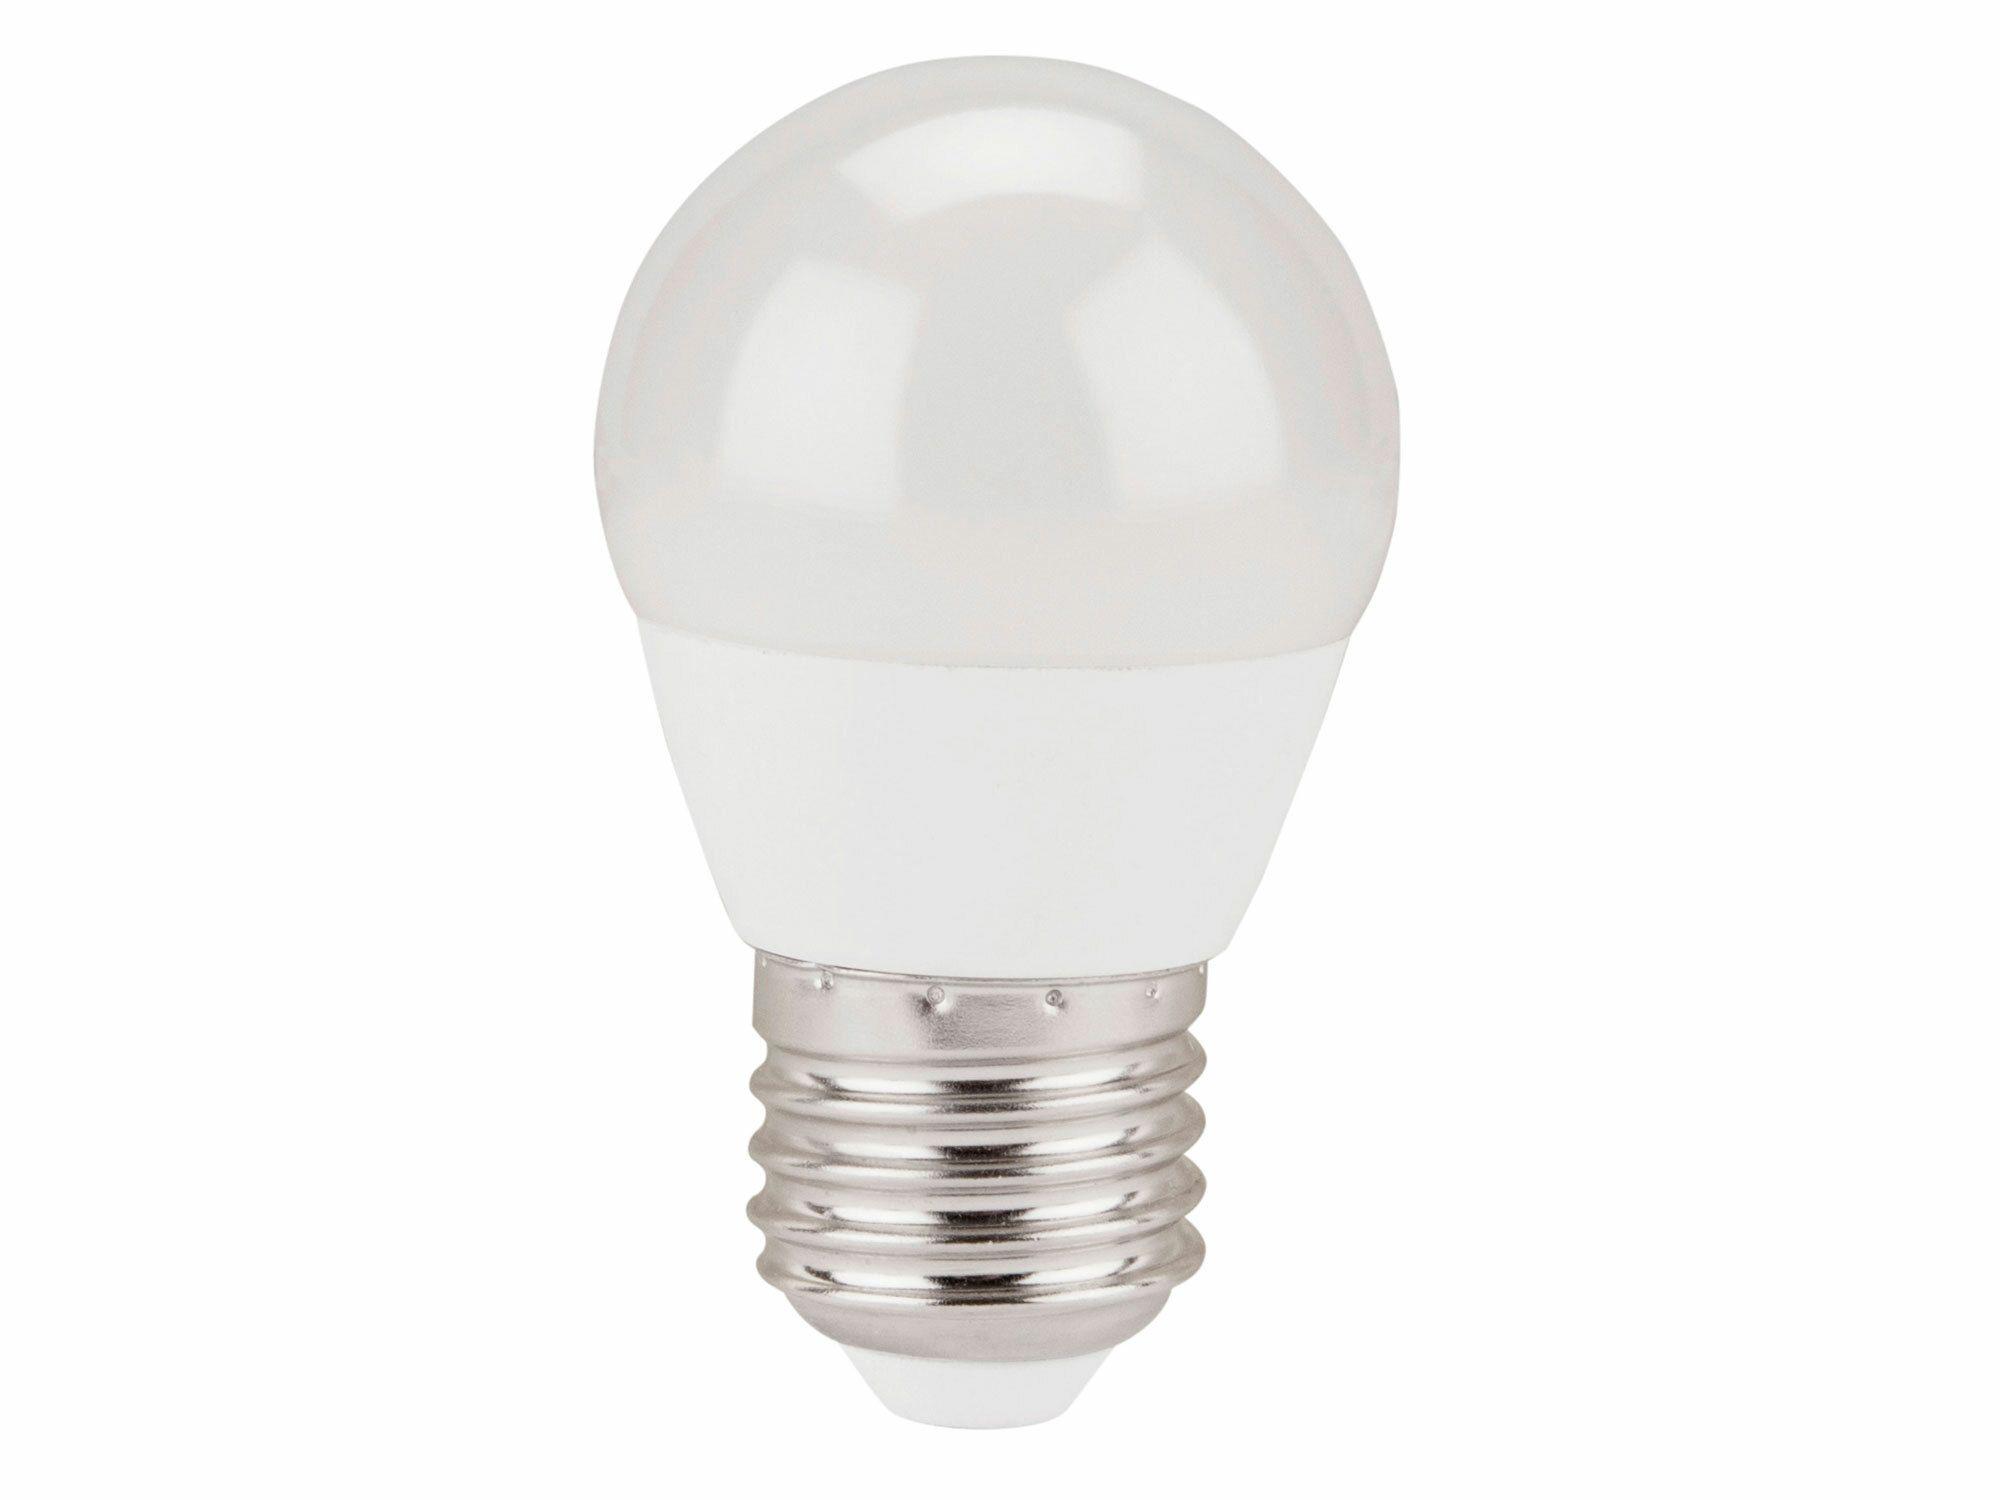 Žárovka LED mini, 5W, 410lm, E27, teplá bílá, EXTOL LIGHT